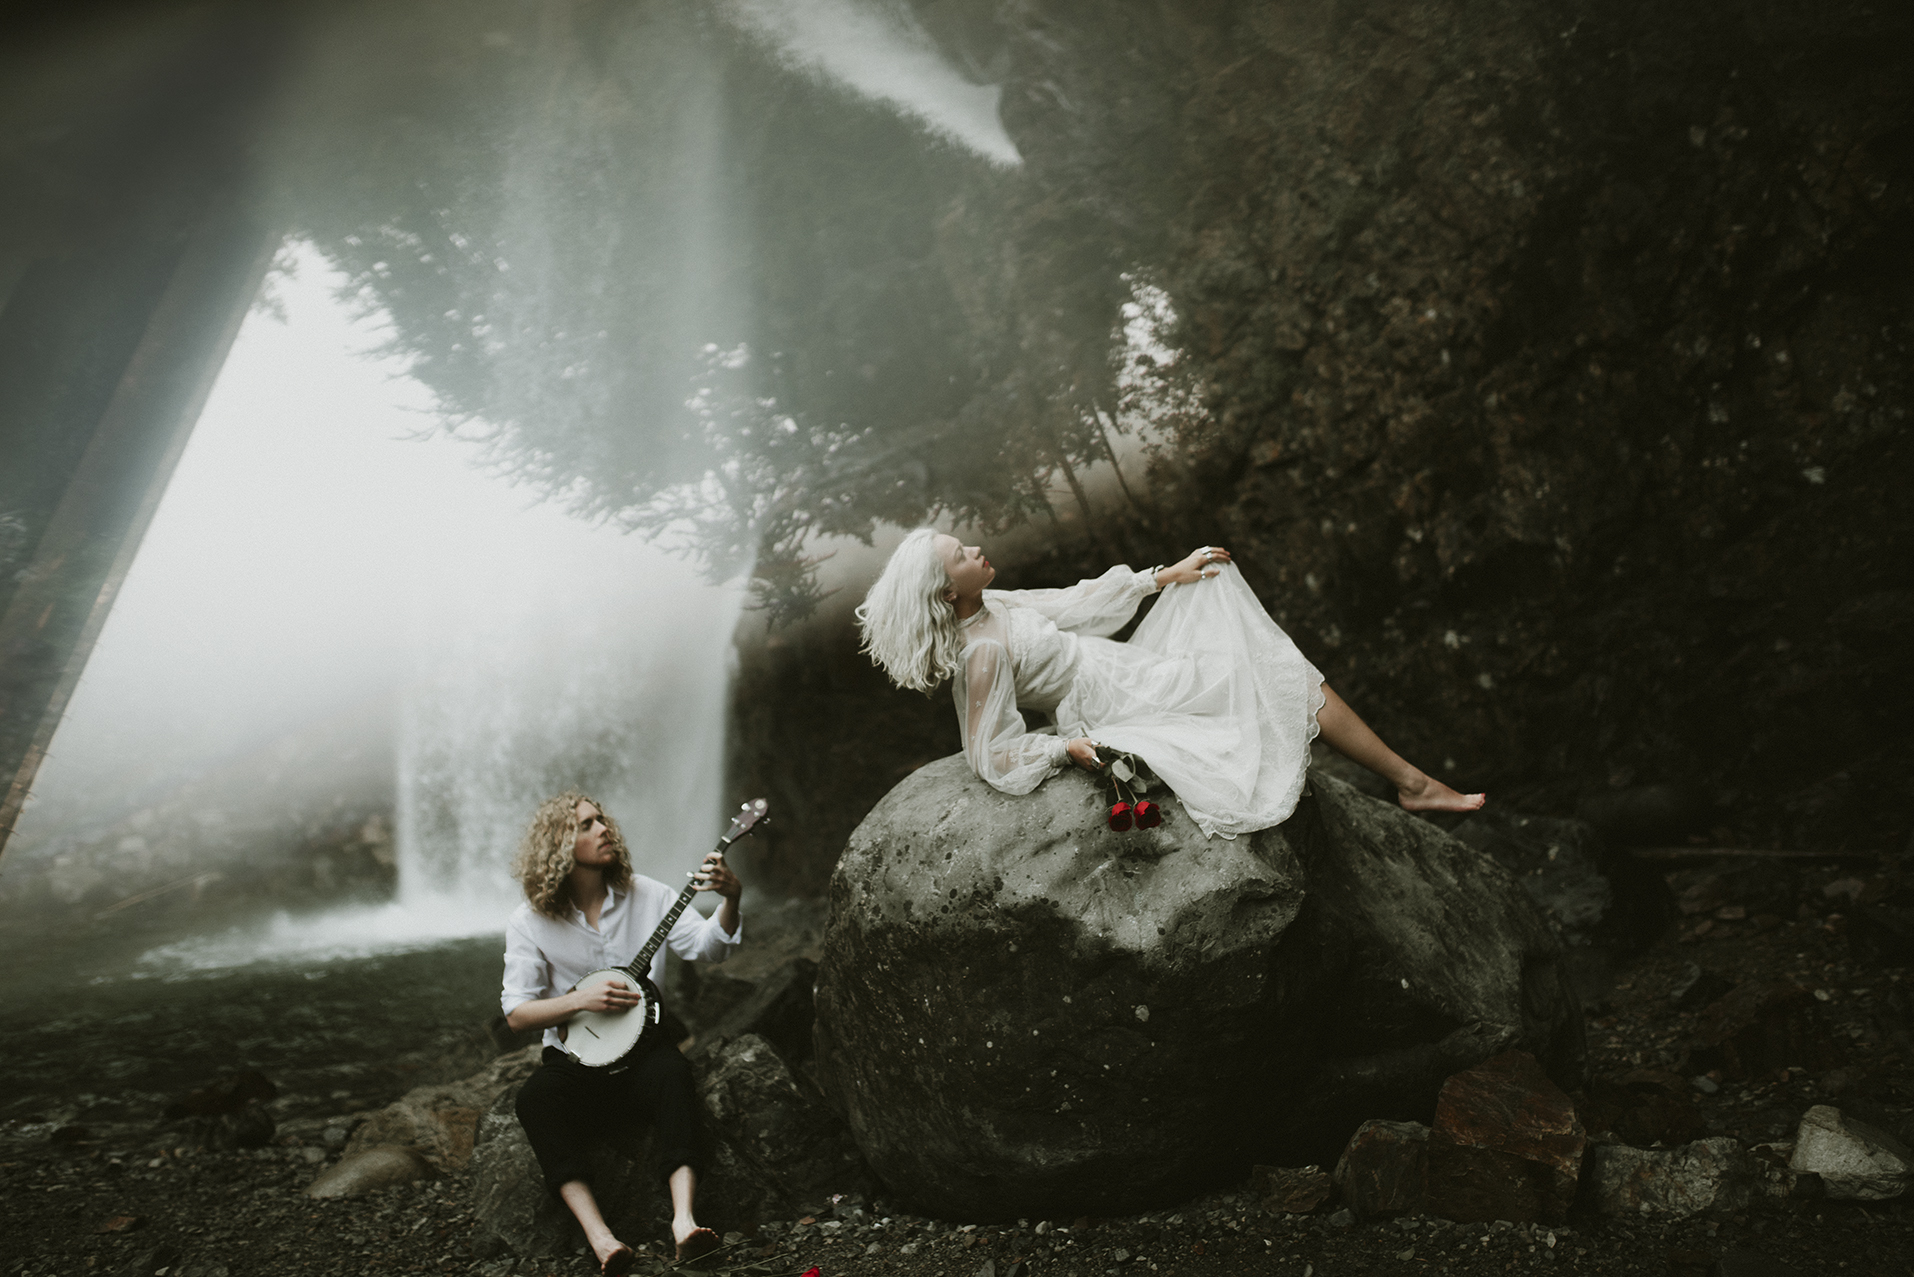 franklin-falls-washington-photoshoot